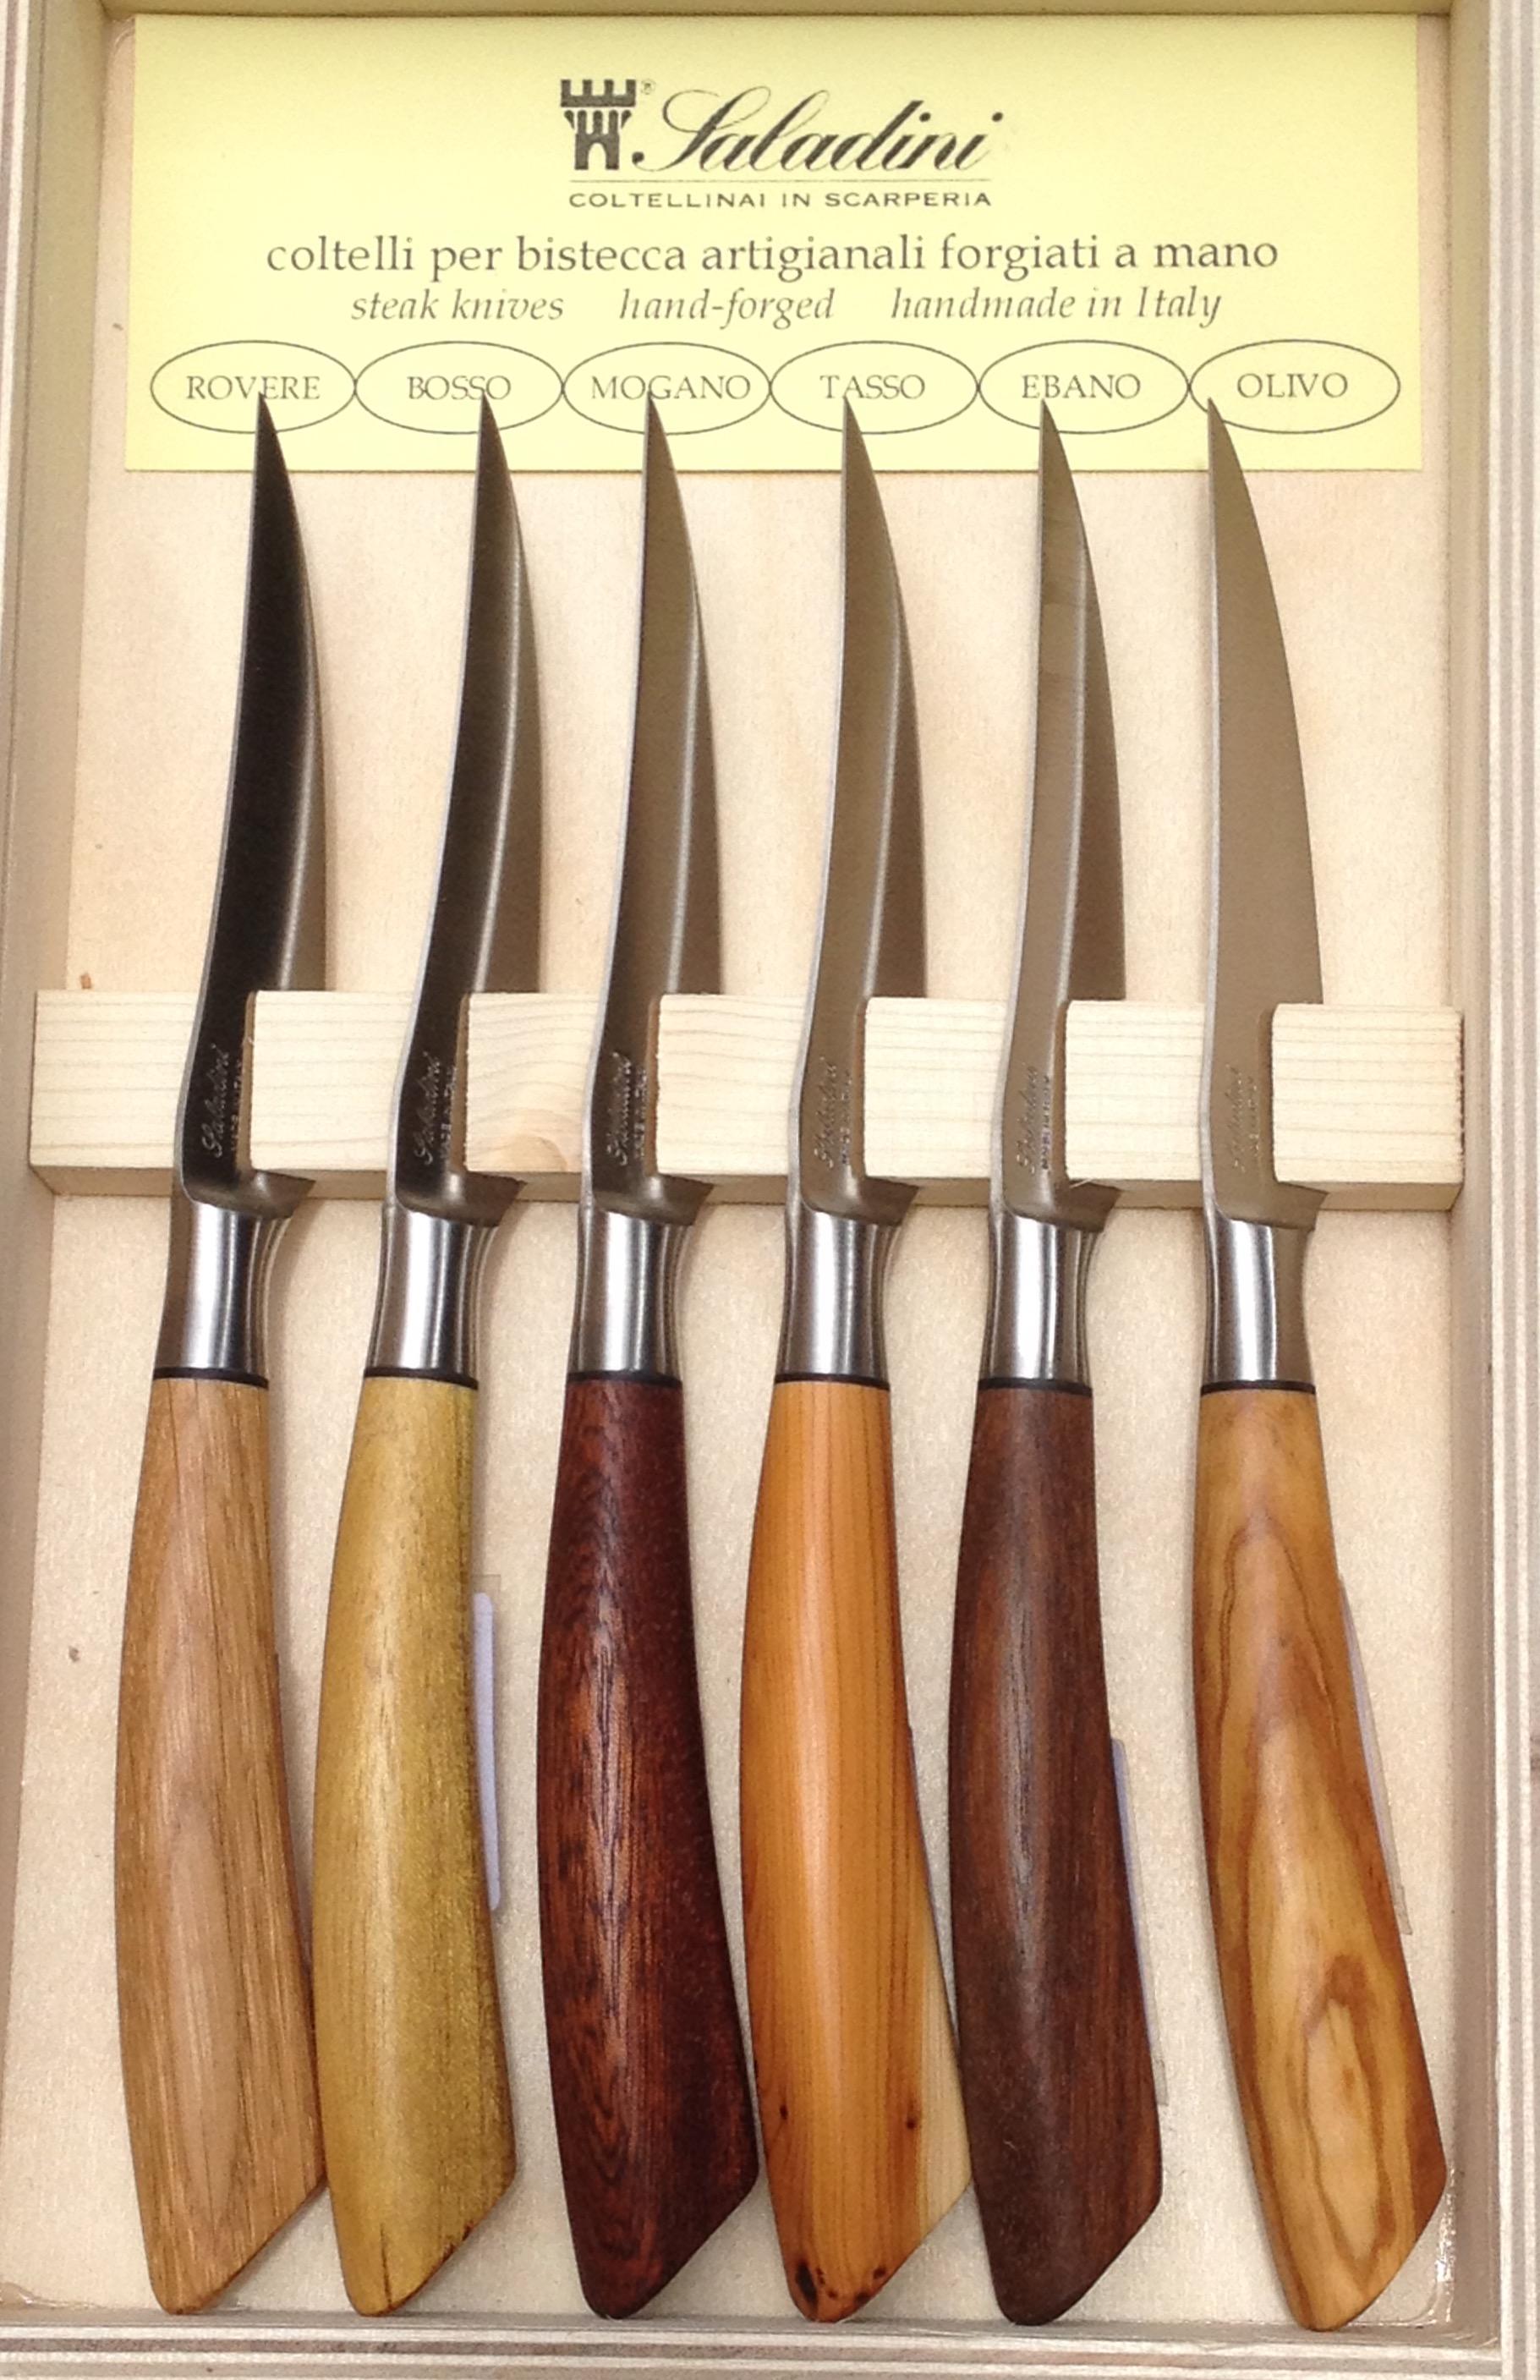 6 coltelli forgiati per bistecca vari legni accessori per - Coltelli da tavola tramontina ...